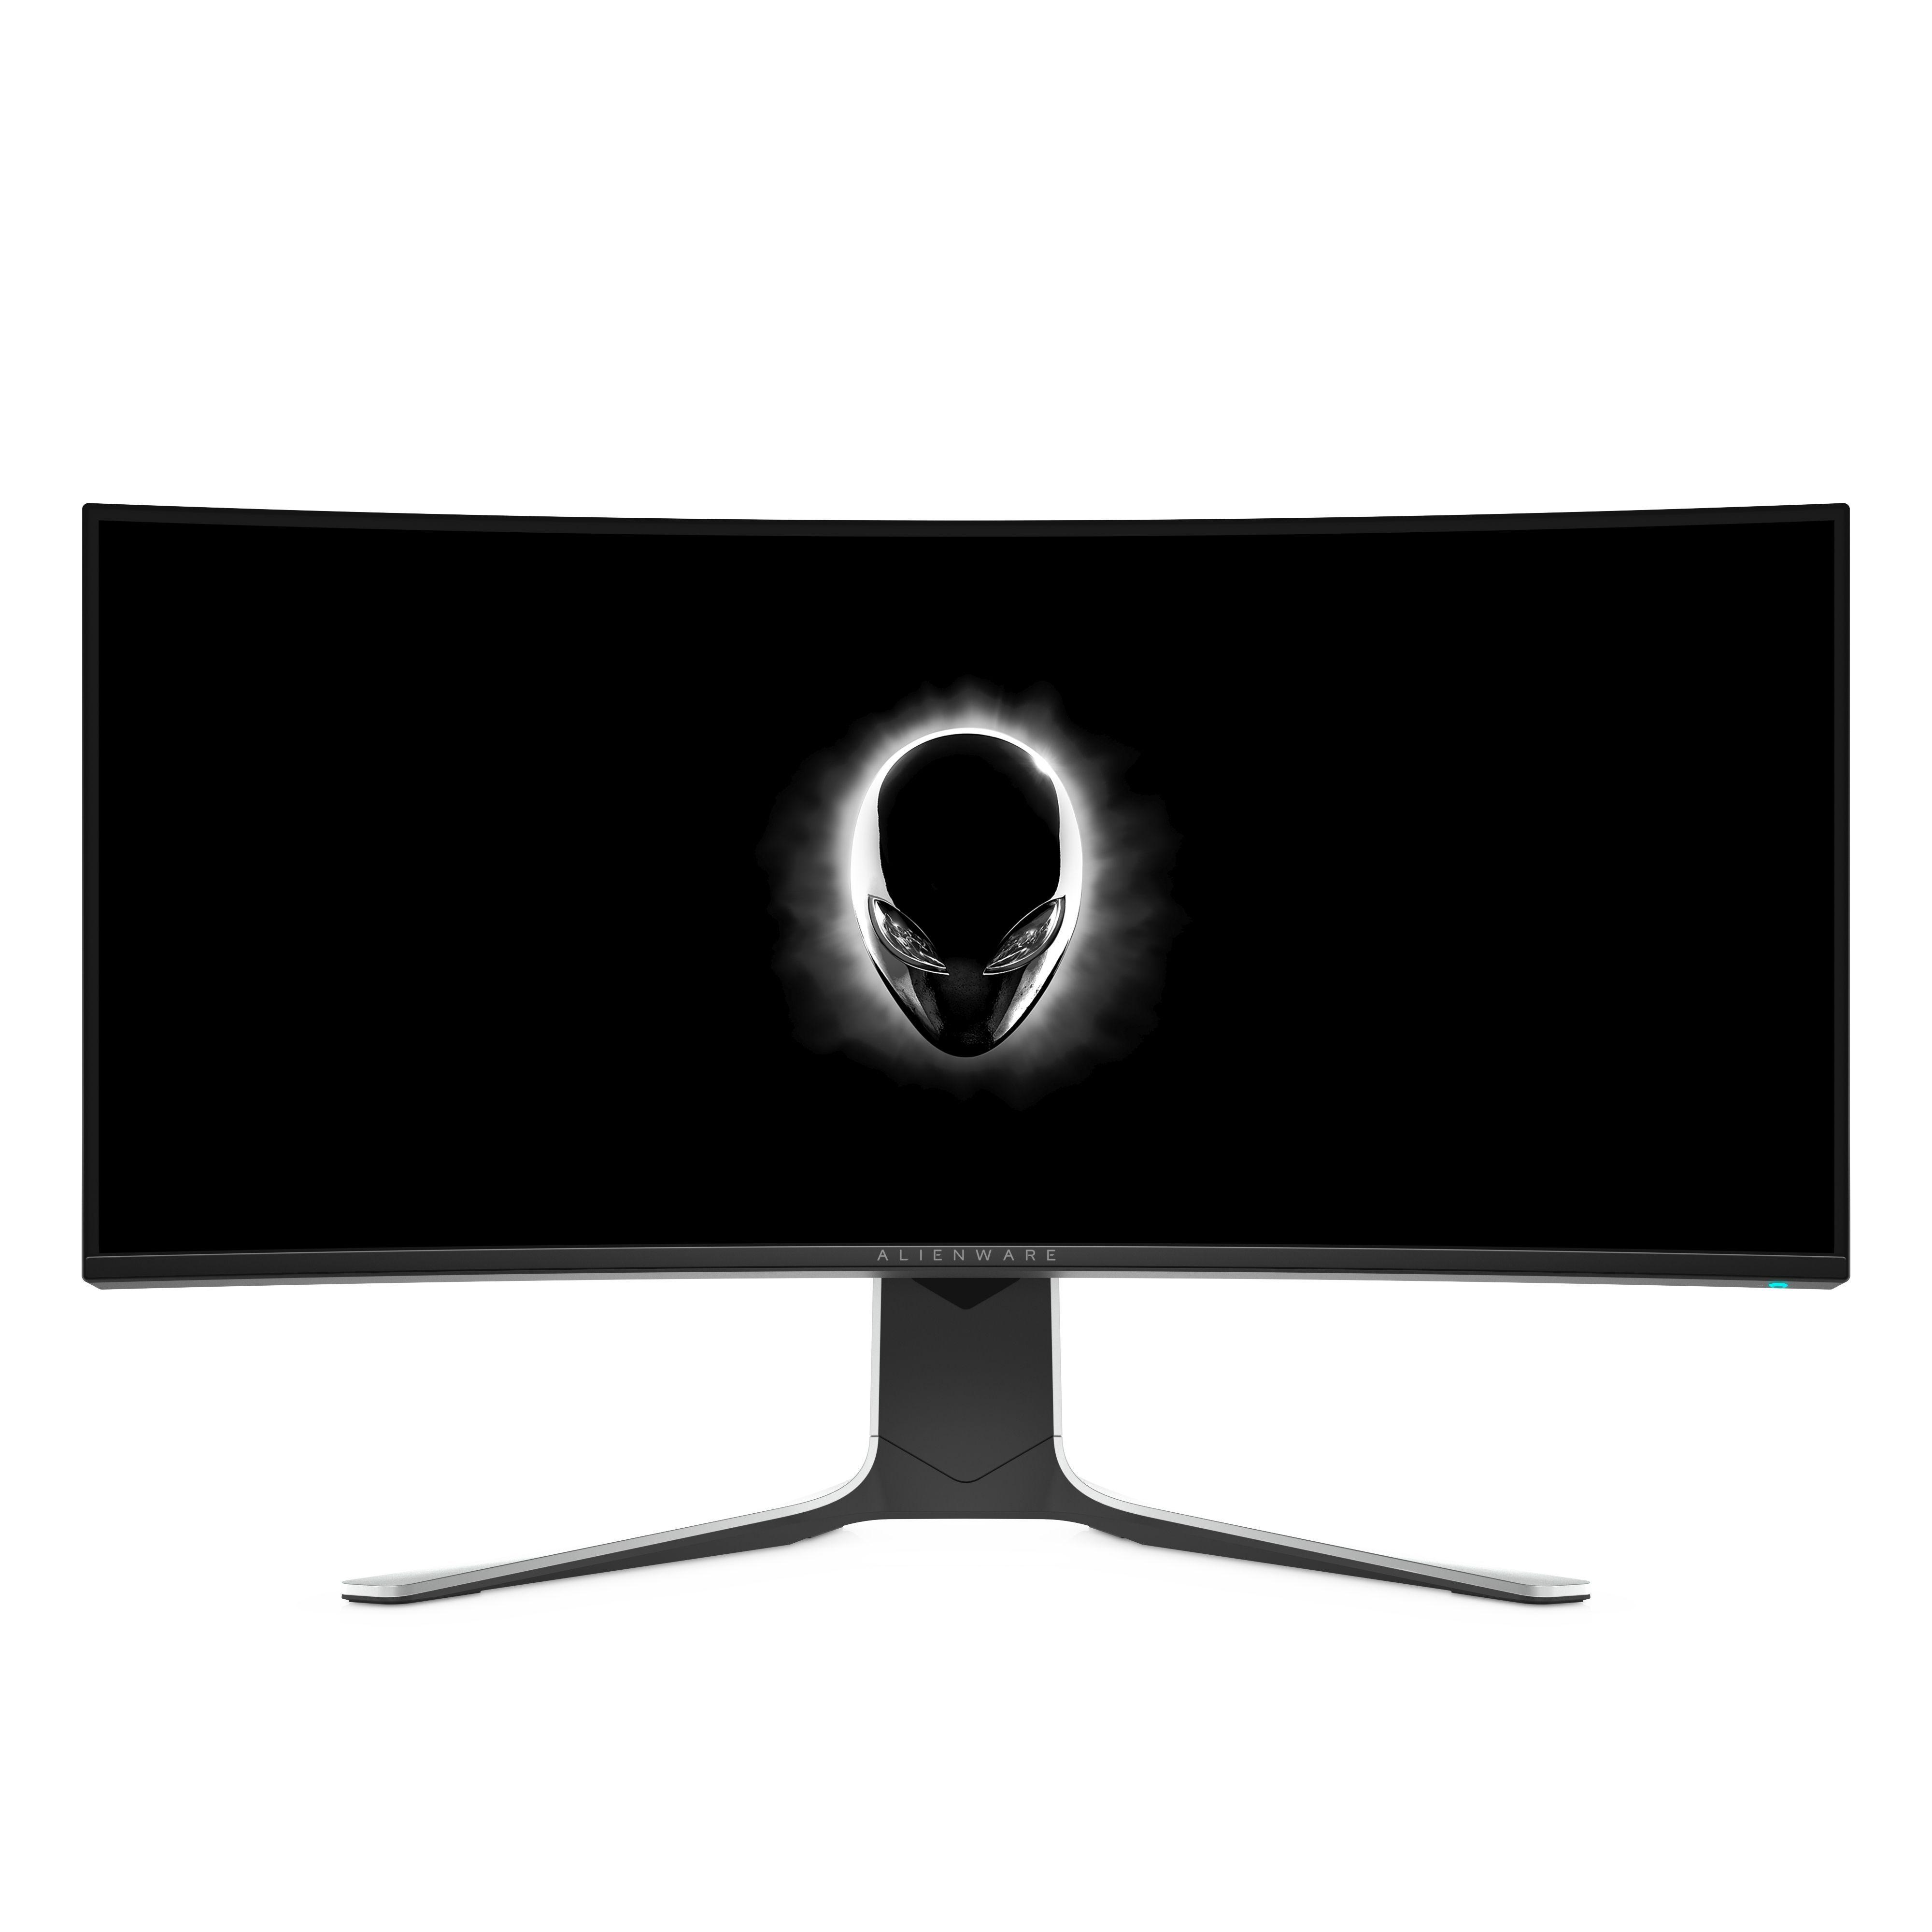 "Alienware AW3420DW 86,6 cm (34.1"") 3440 x 1440 Pixels UltraWide Quad HD LCD Zwart, Wit"